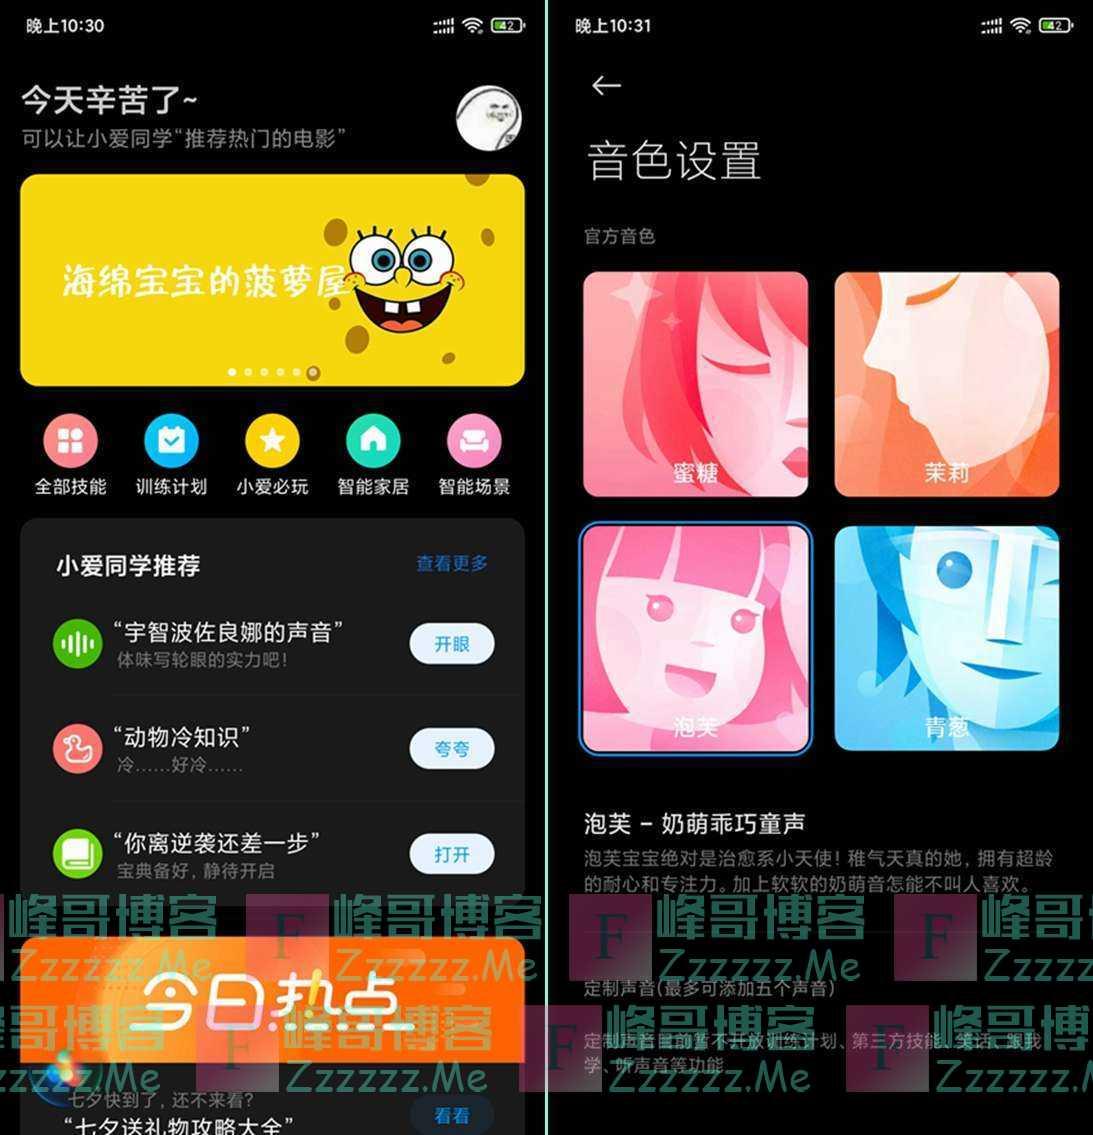 "MIUI小爱同学V5.14最新内测版本下载 奶萌的儿童音色""泡芙""来啦"